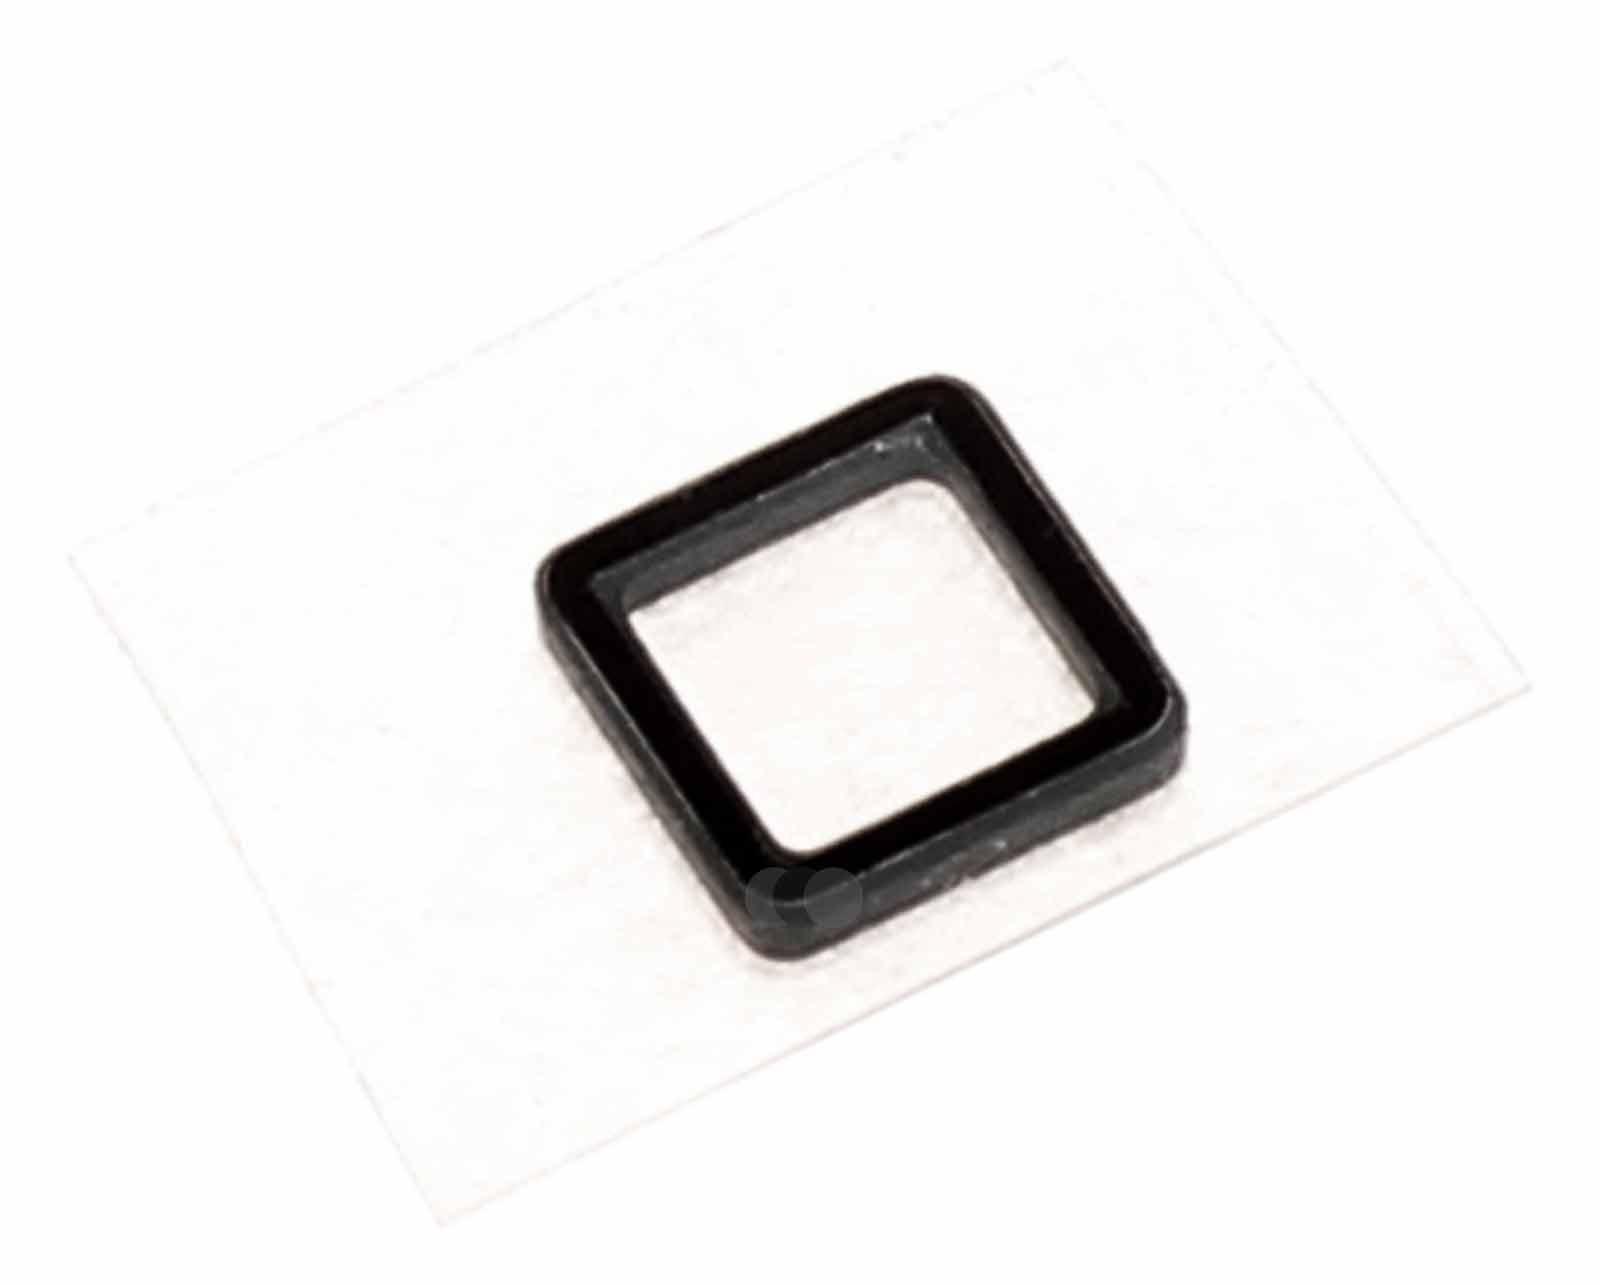 Original Samsung Gear Fit 2 Pro SM-R365 Dichtung für Herzfrequenz-Sensor, GH98-39740A